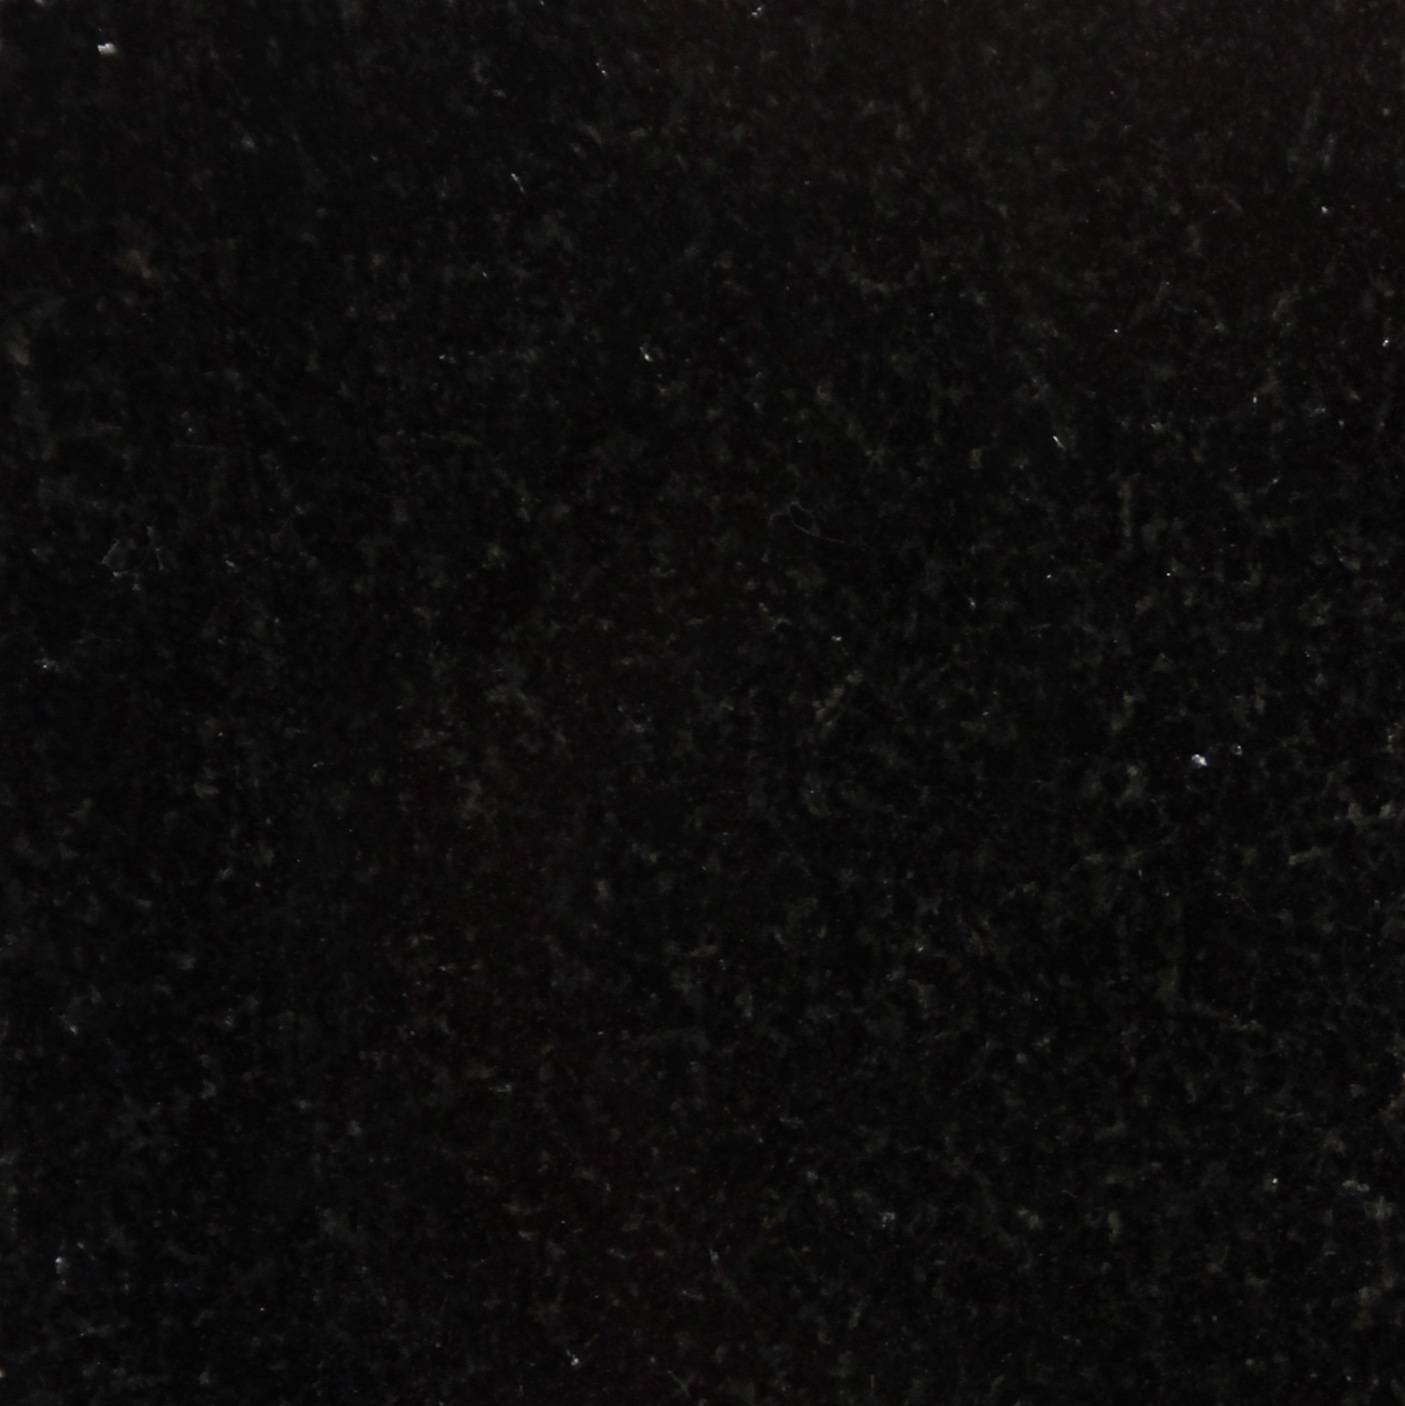 33.bsolute-blackbis